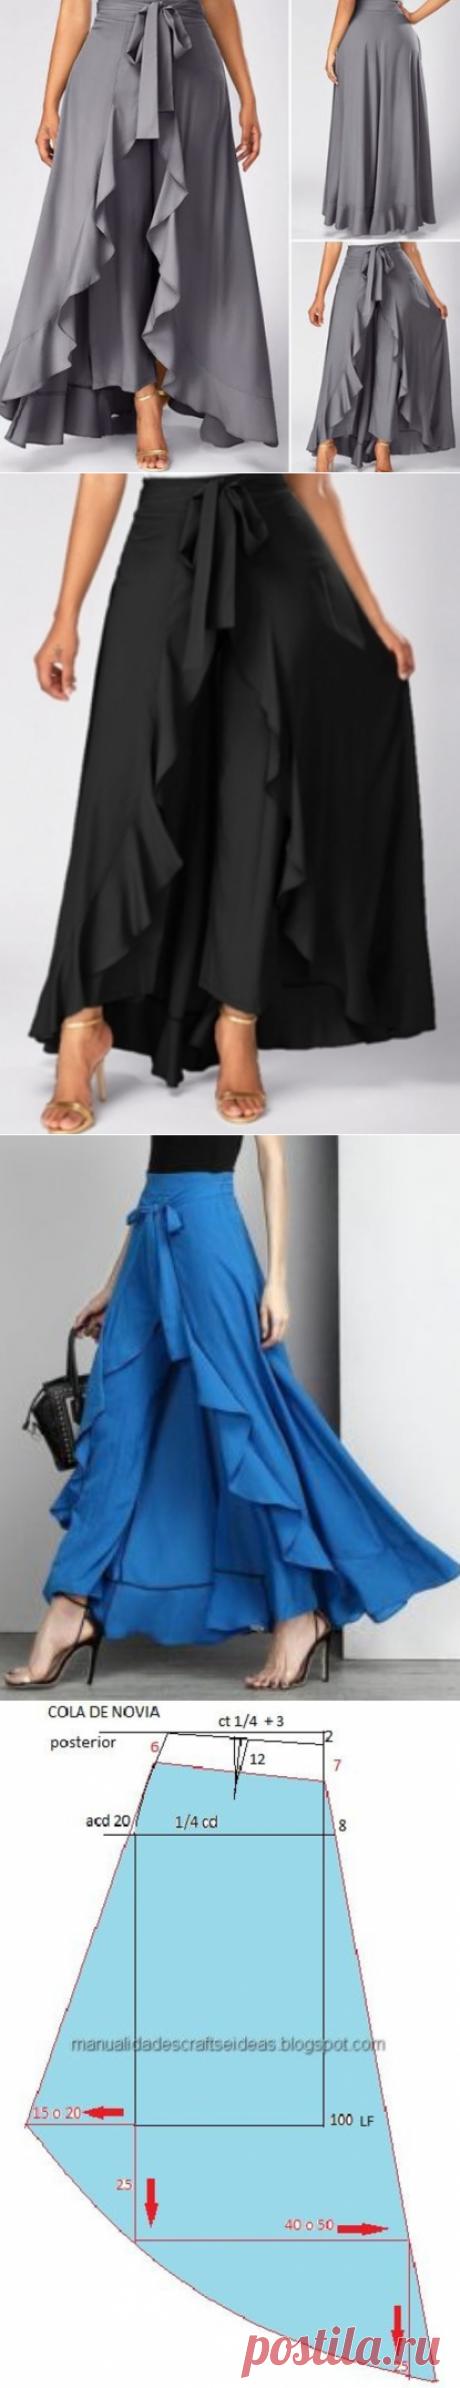 ОК. Юбка - брюки палаццо.